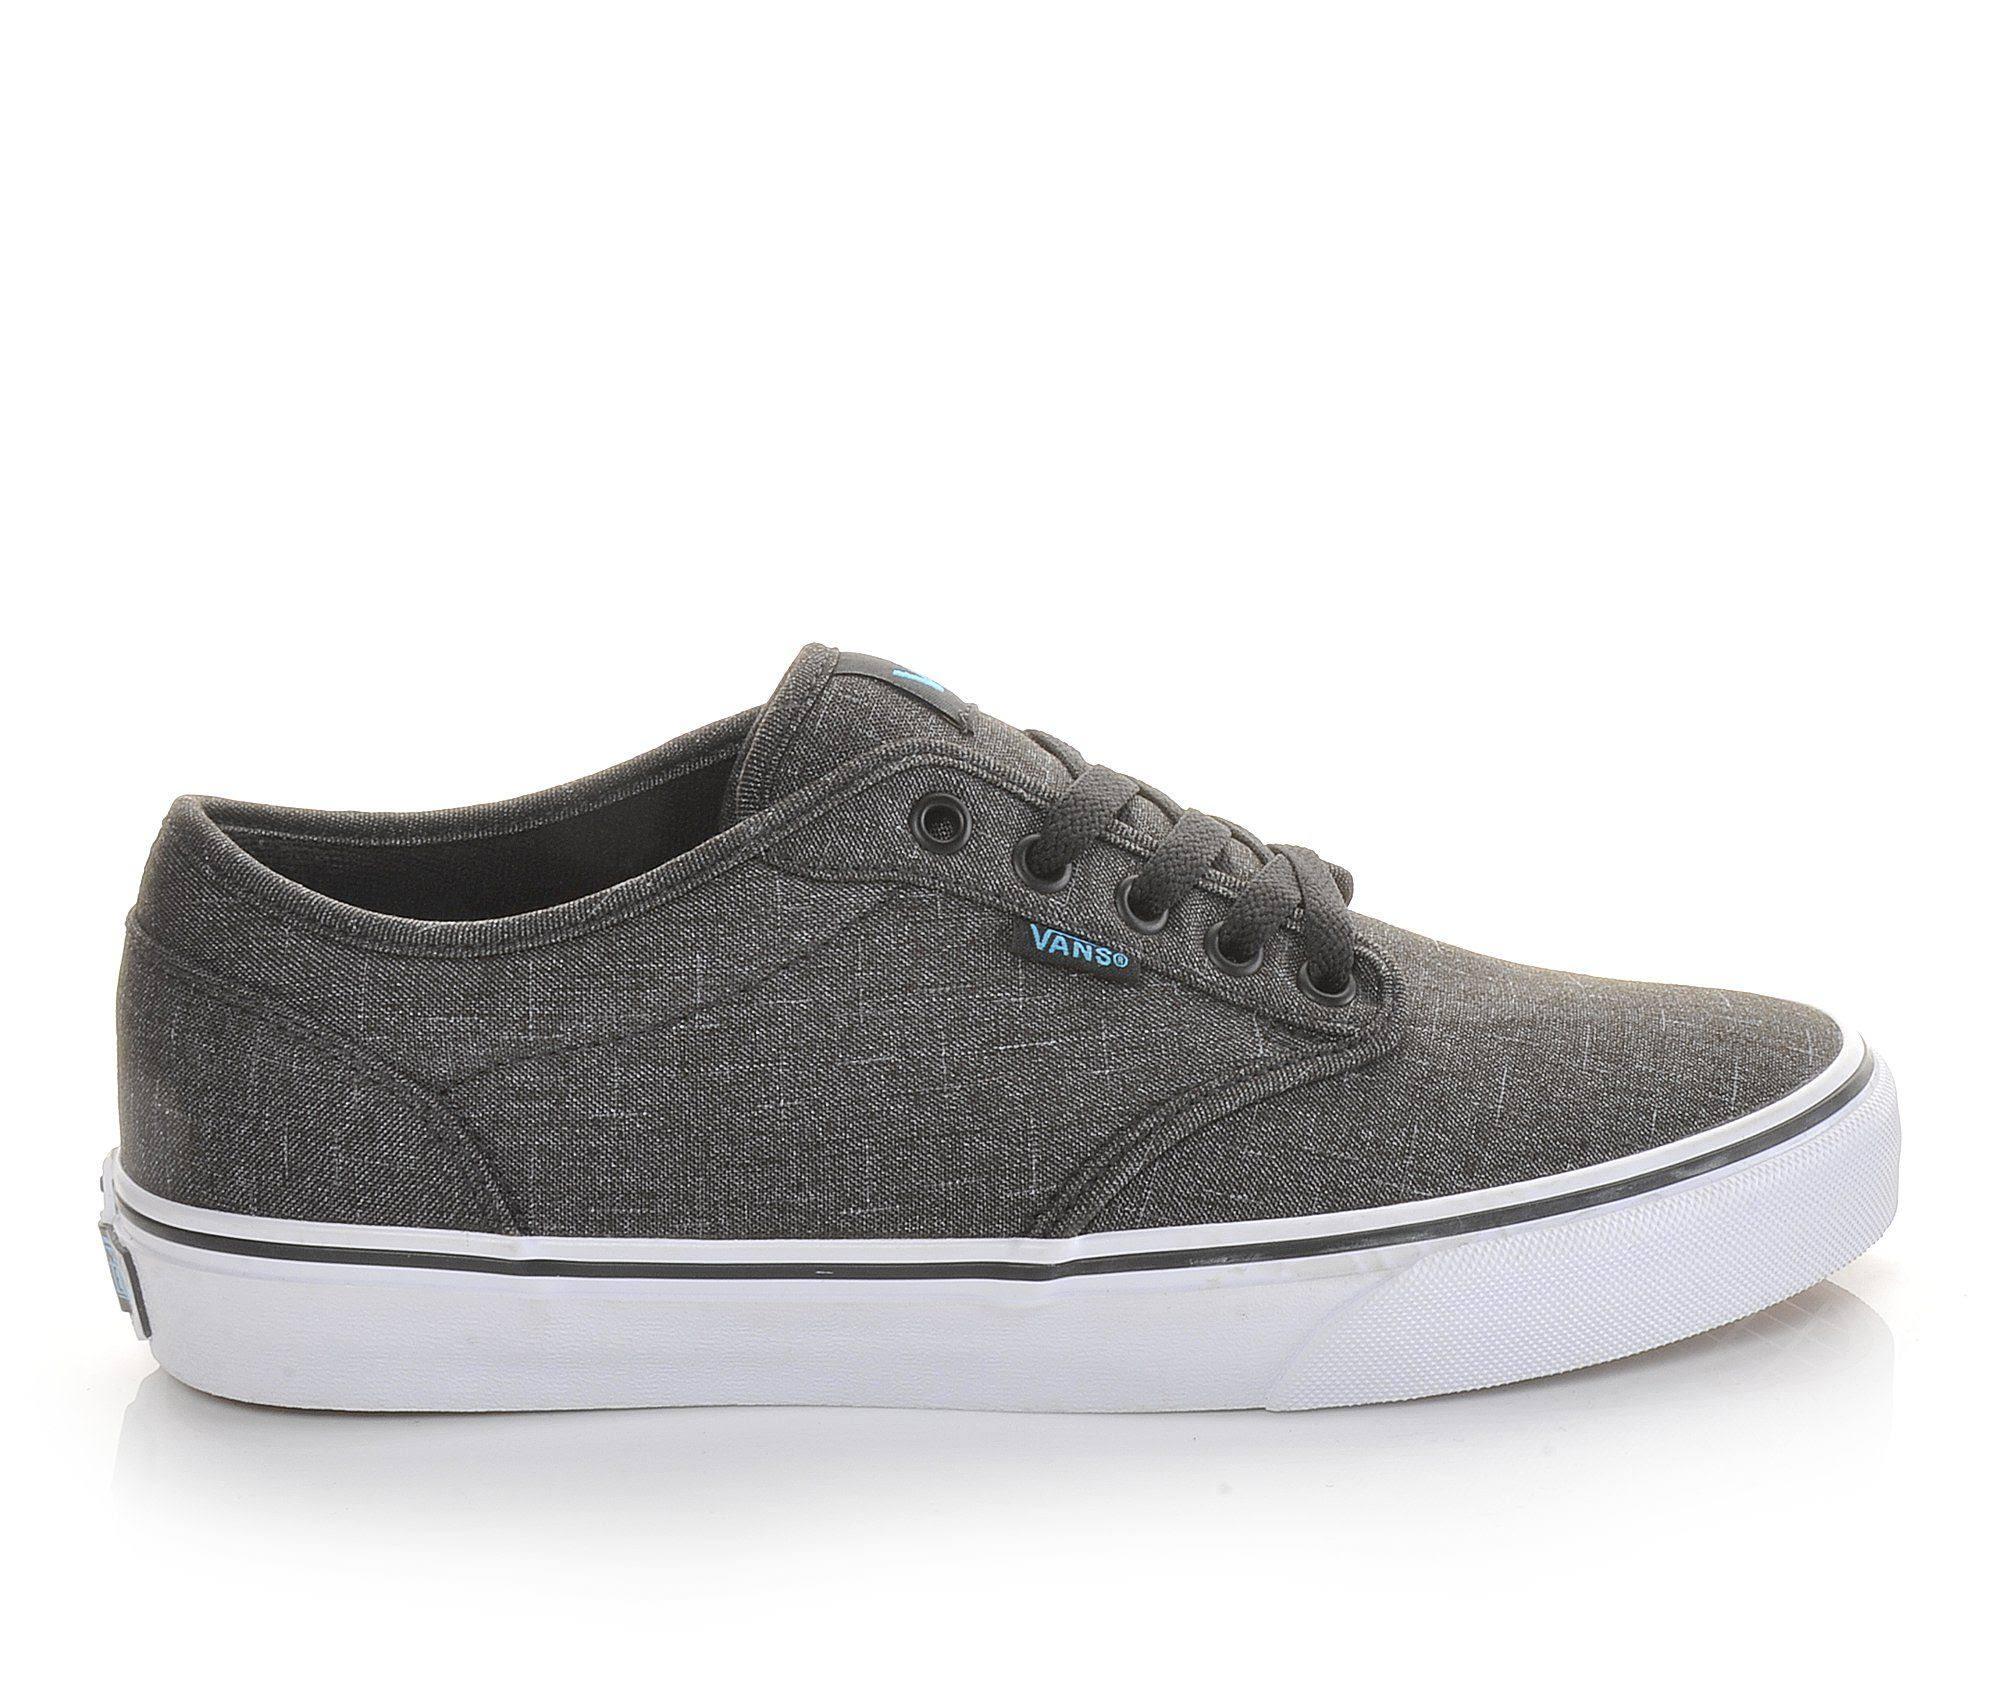 Textile 12 Vans Hombre Skate Shoes Atwood Tamaño negro Para aq8q5r